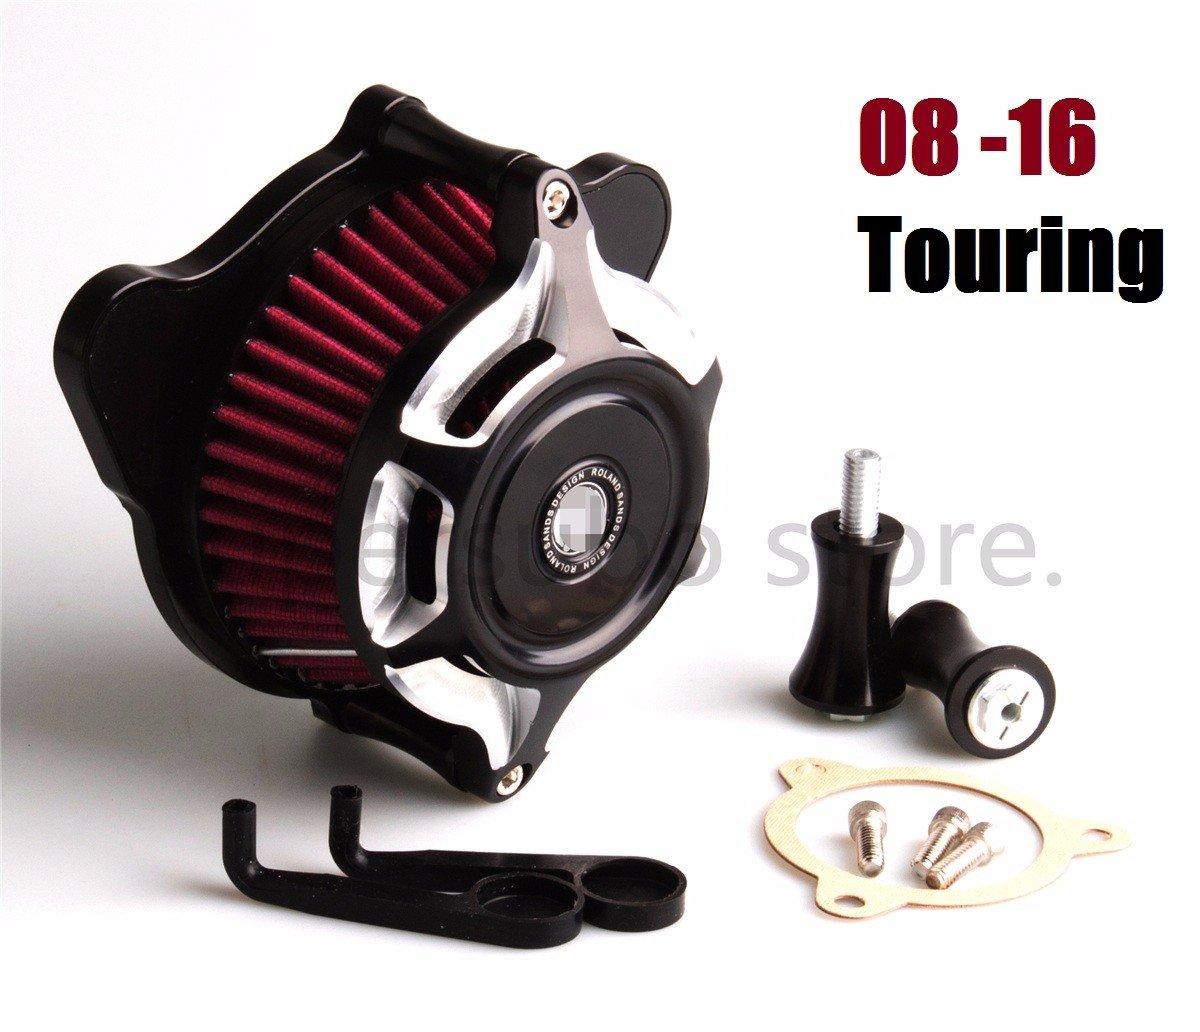 Motorcycle Contrast Cut RSD Split Blunt Air intake air Cleaner filter For Harley Touring street Glide 08-16   B07875623K